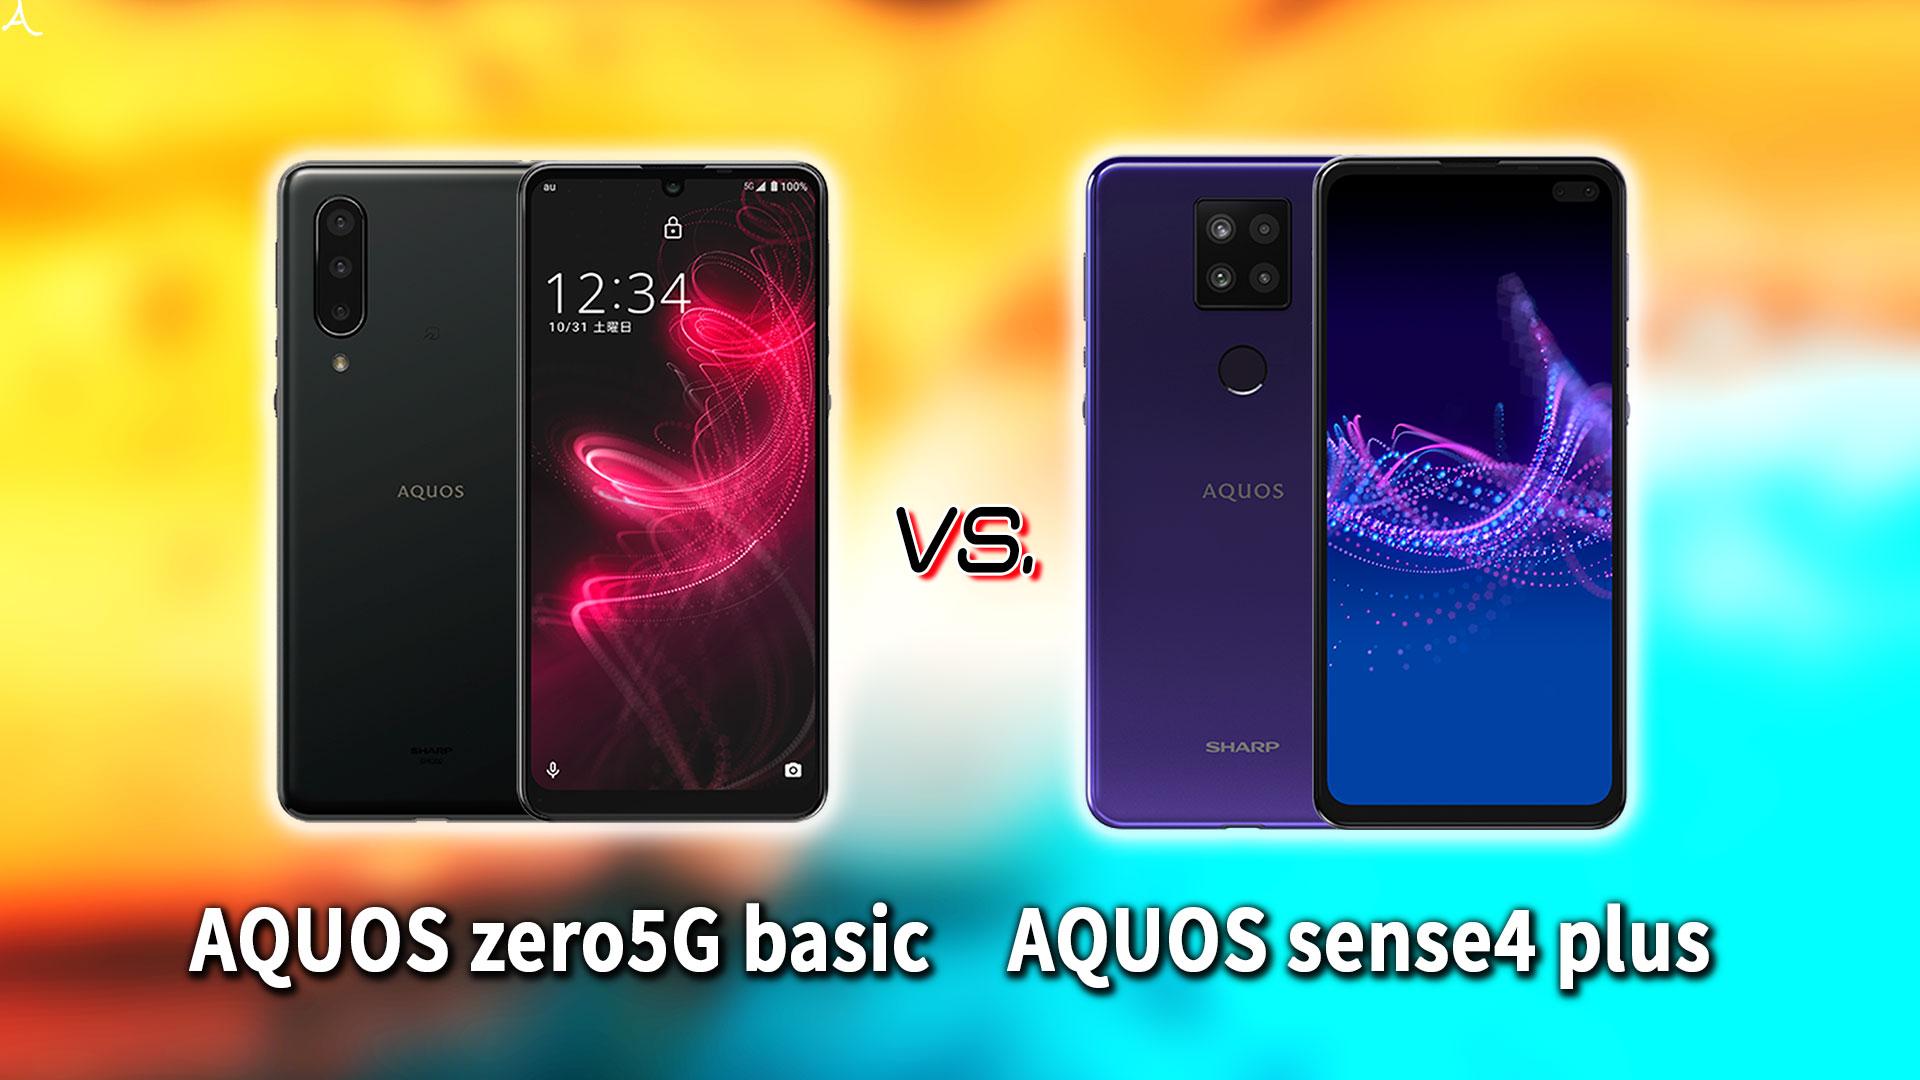 「AQUOS zero5G basic」と「AQUOS sense4 plus」の違いを比較:どっちを買う?